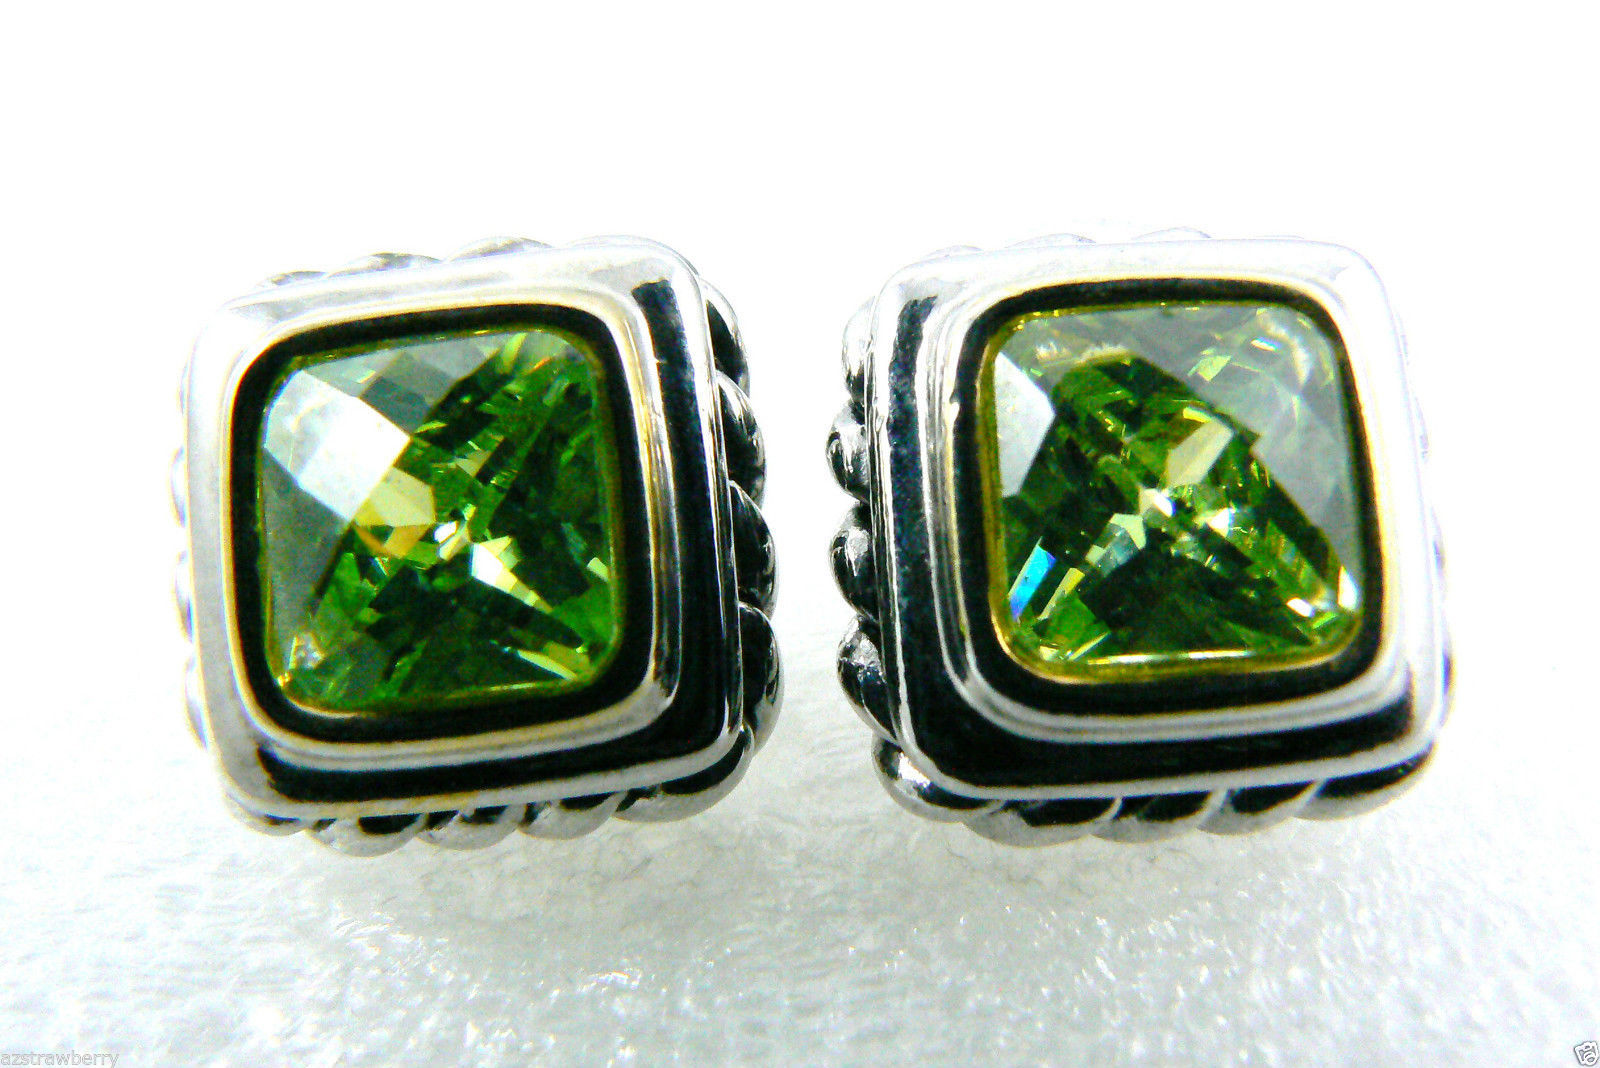 Silver tone Faceted Green Peridot CZ Cubic Zirconia stud earrings $0 sh new image 2